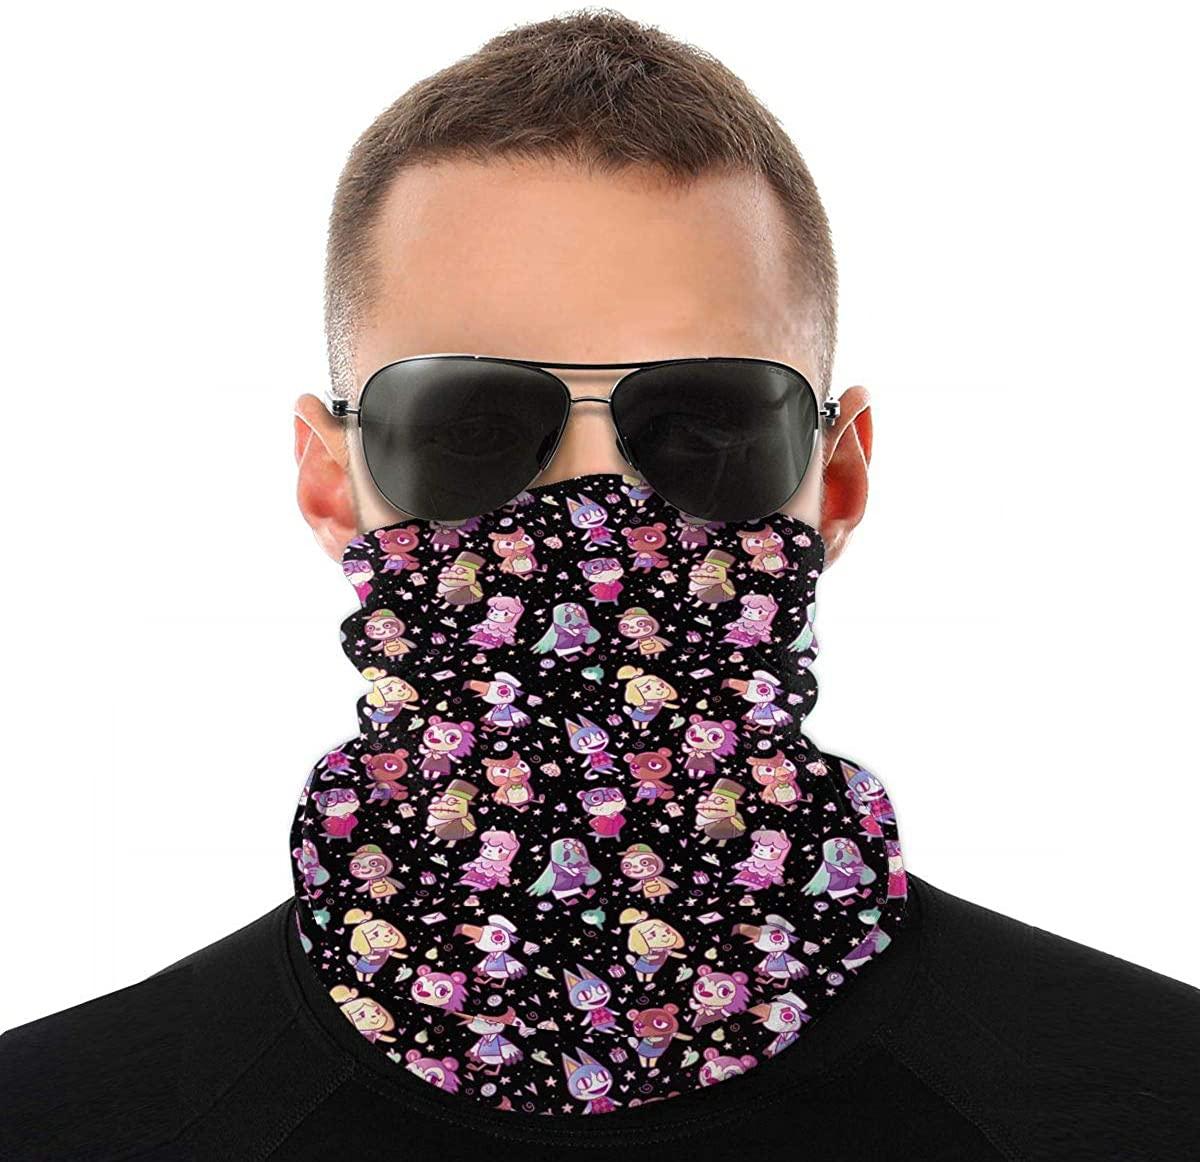 Mans Woman's Full Coverage Tube Seamless Scarf Bandana Neck Gaiter Head Mask Sunscreen UV Dust Protection for Running